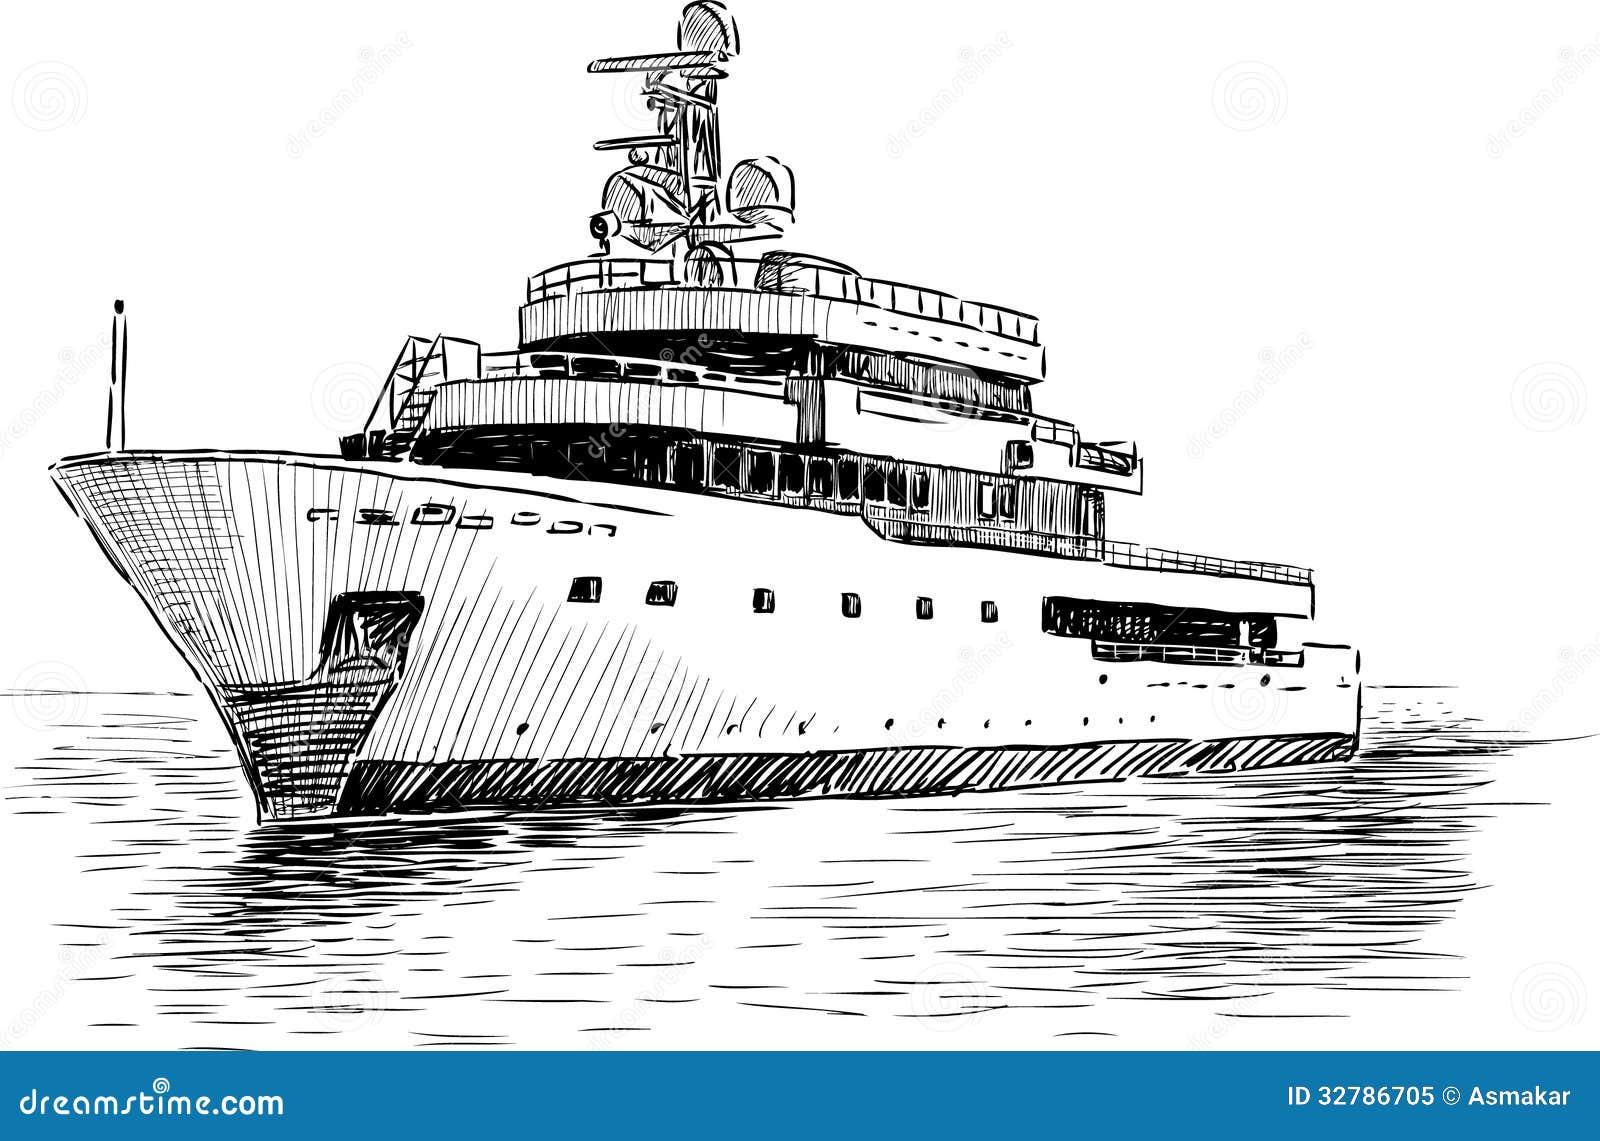 Amazoncom disney cruise picture frame